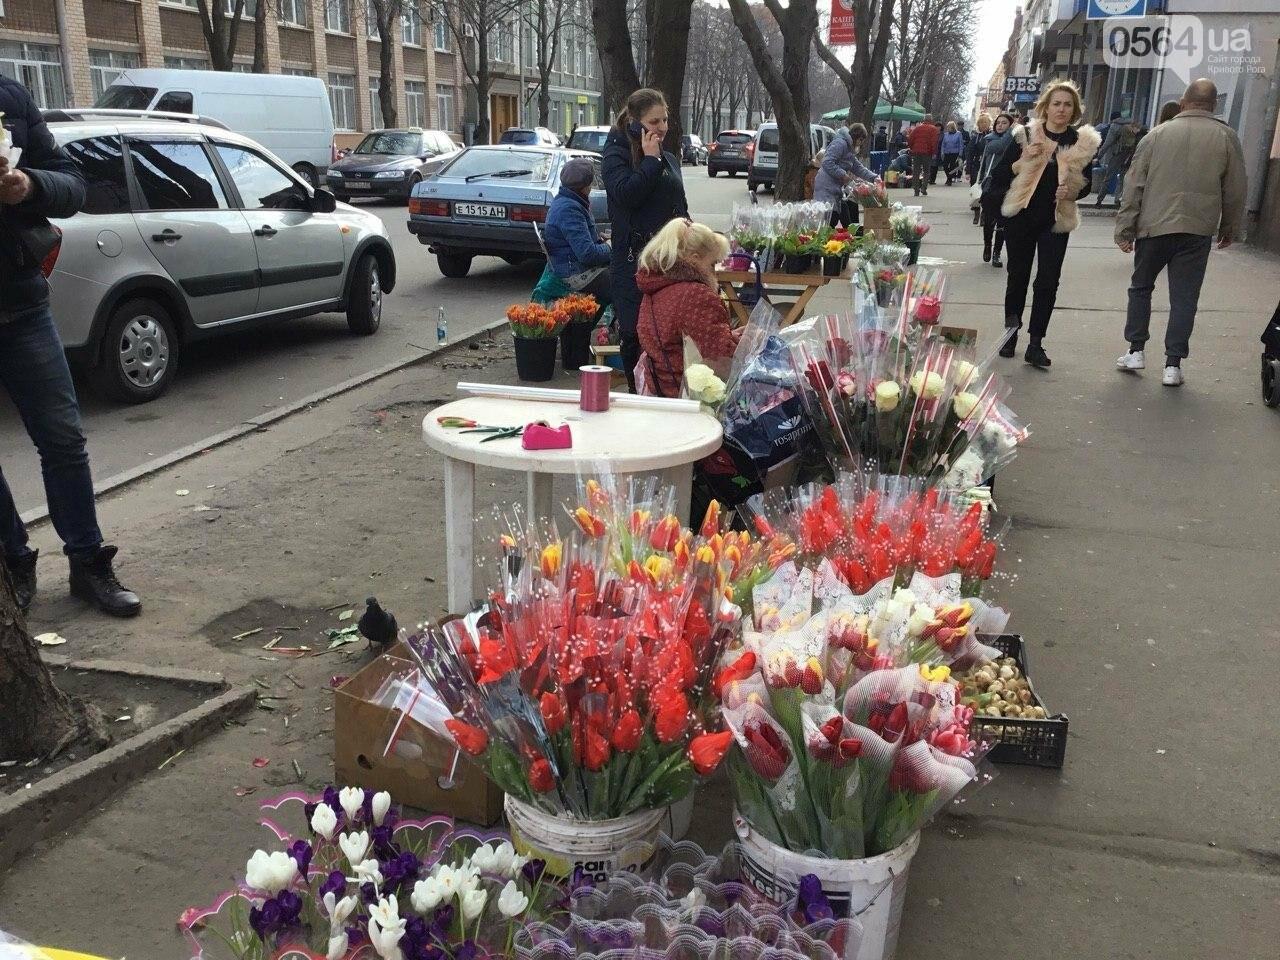 Сколько стоят примула, цикламен, мимоза? Обзор цен на цветы в Кривом Роге, - ФОТО, ВИДЕО, фото-33